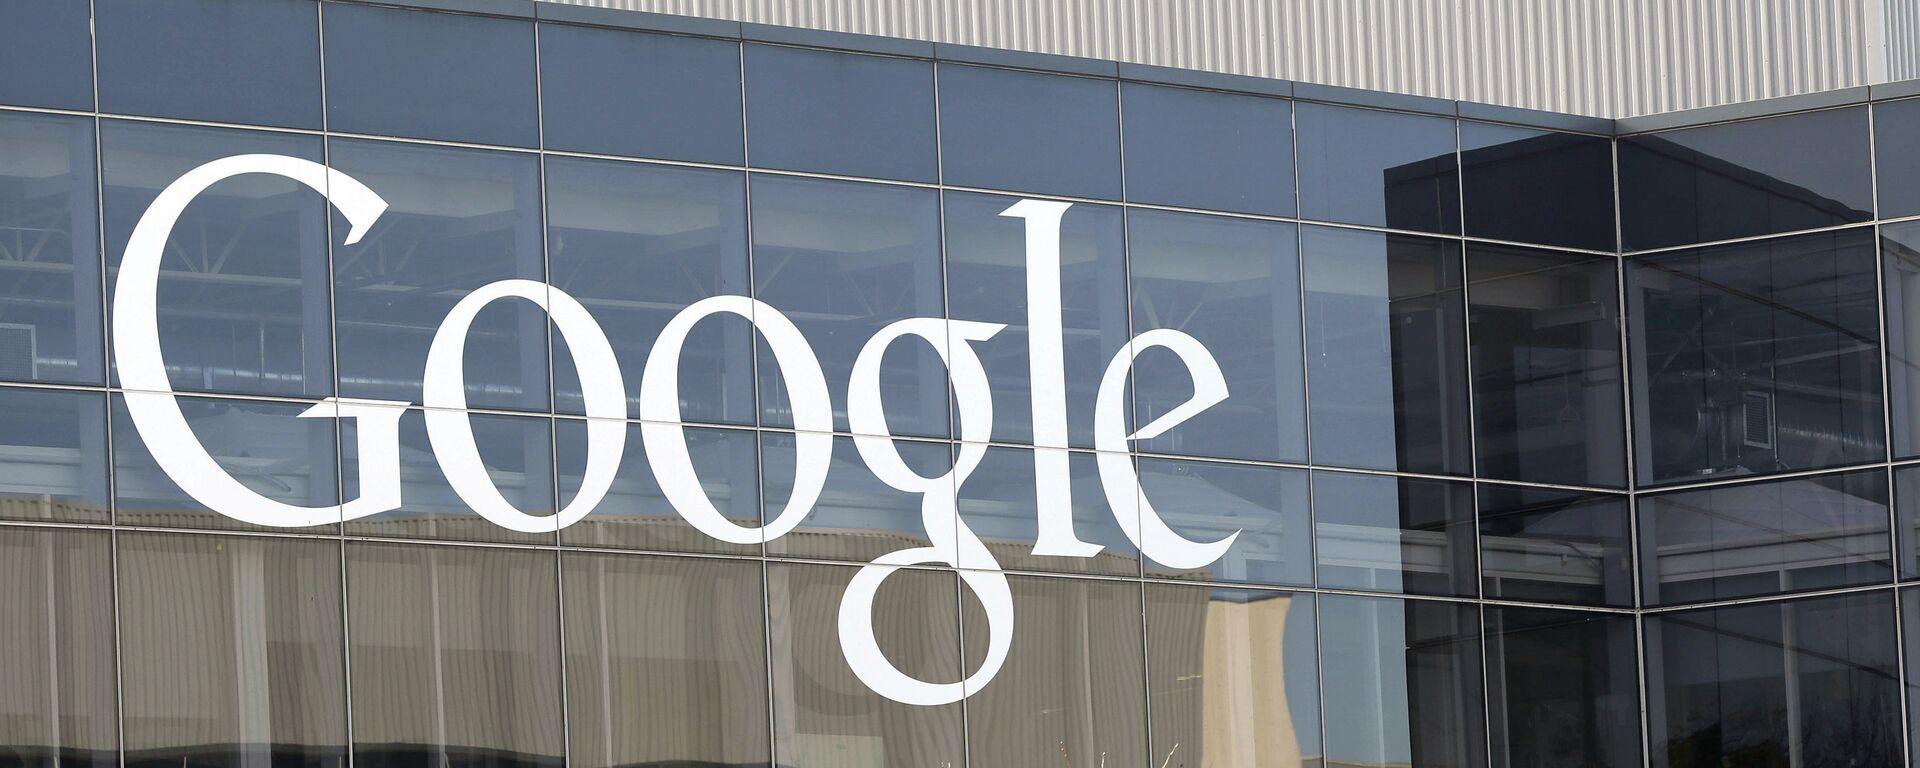 Google headquarters in Mountain View, Calif. 2013 - Sputnik Italia, 1920, 13.07.2021